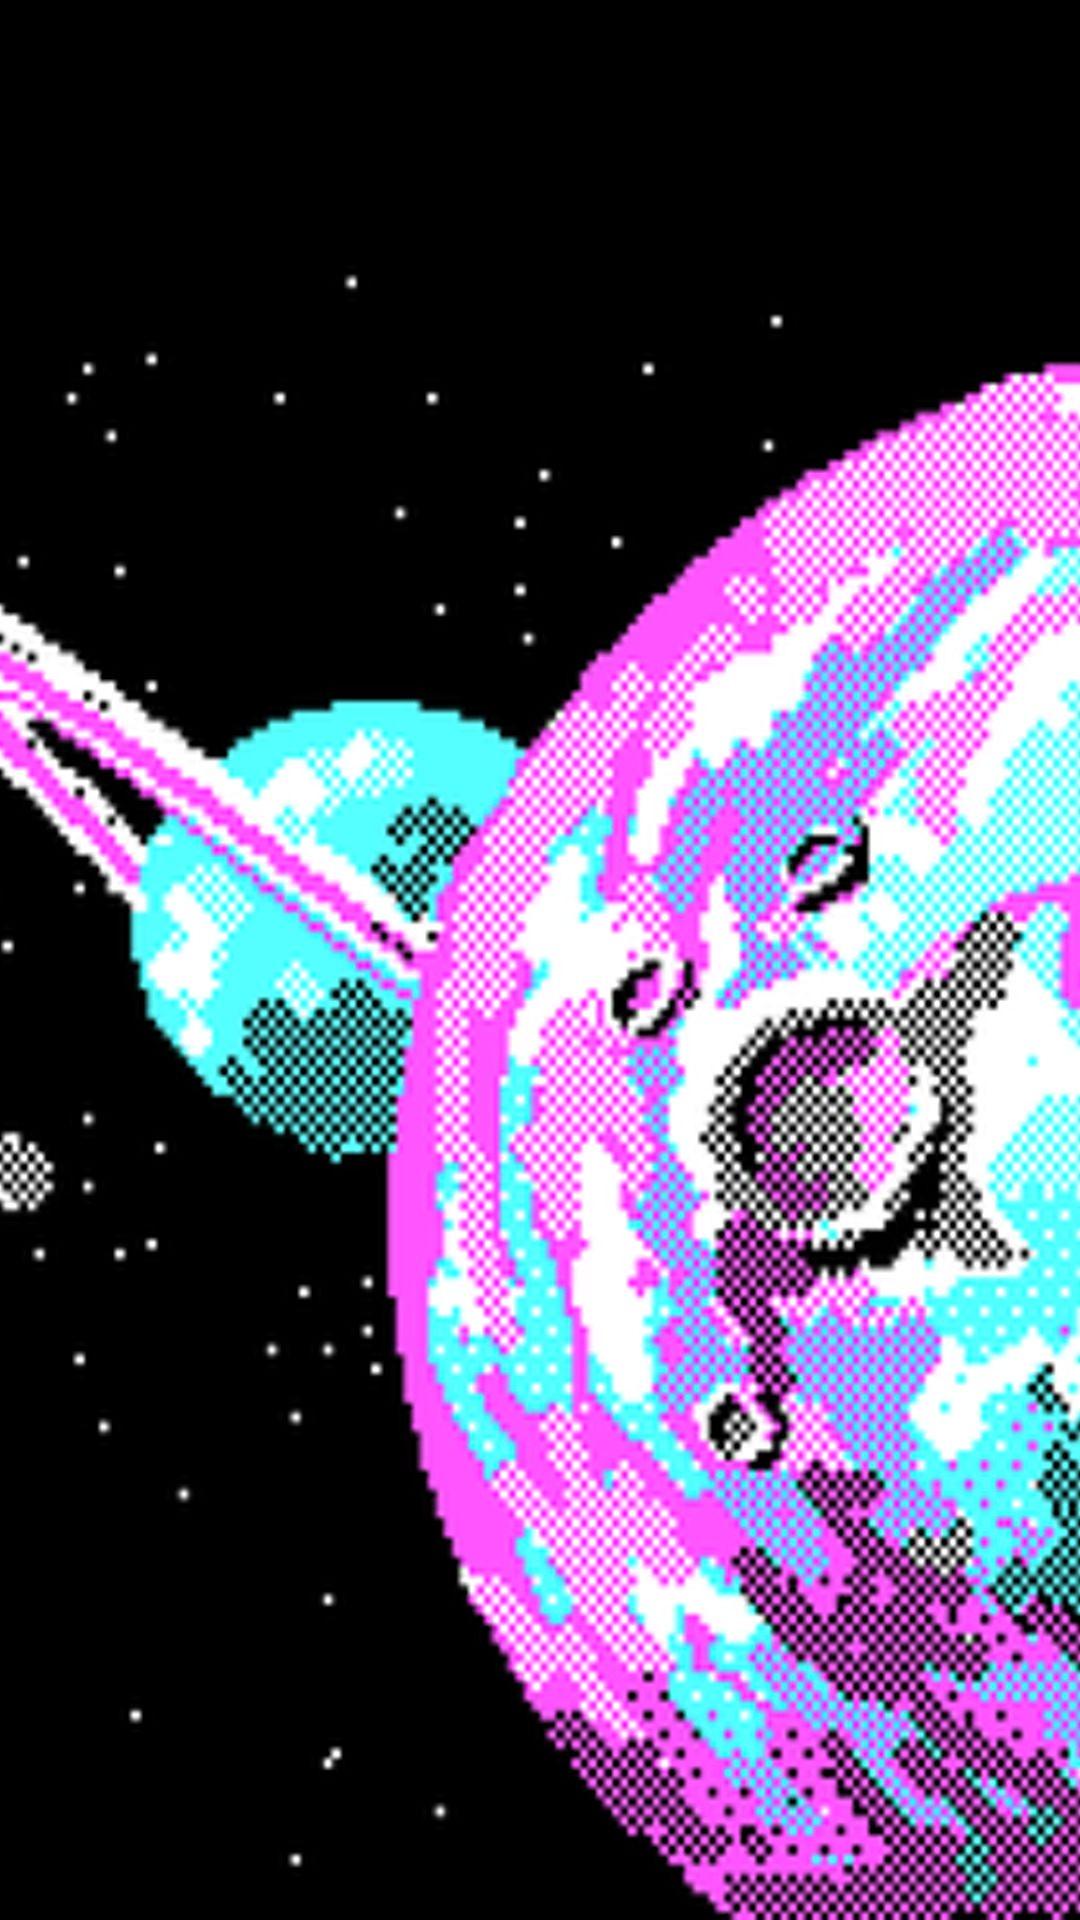 Pixel Art Wallpaper Tumblr Space Art Wallpaper Pixel Art